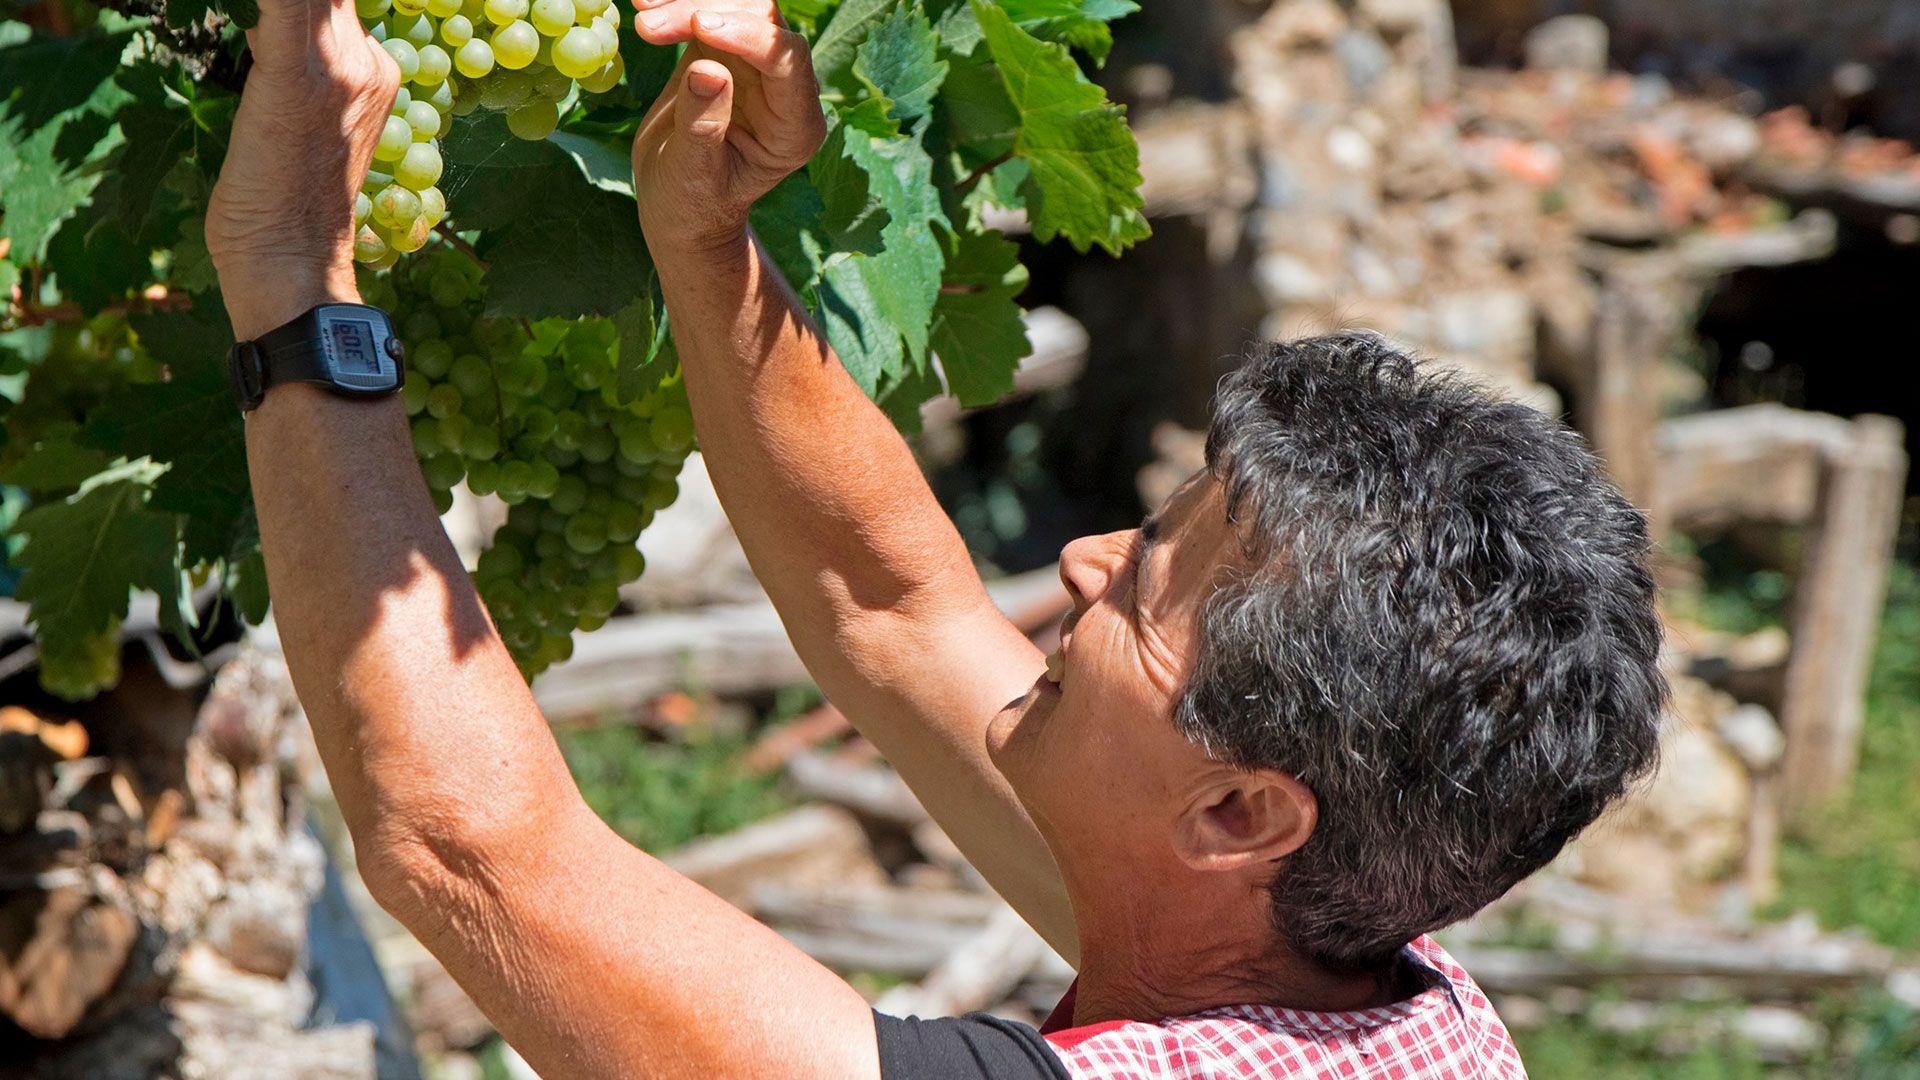 Señora recogiendo uvas